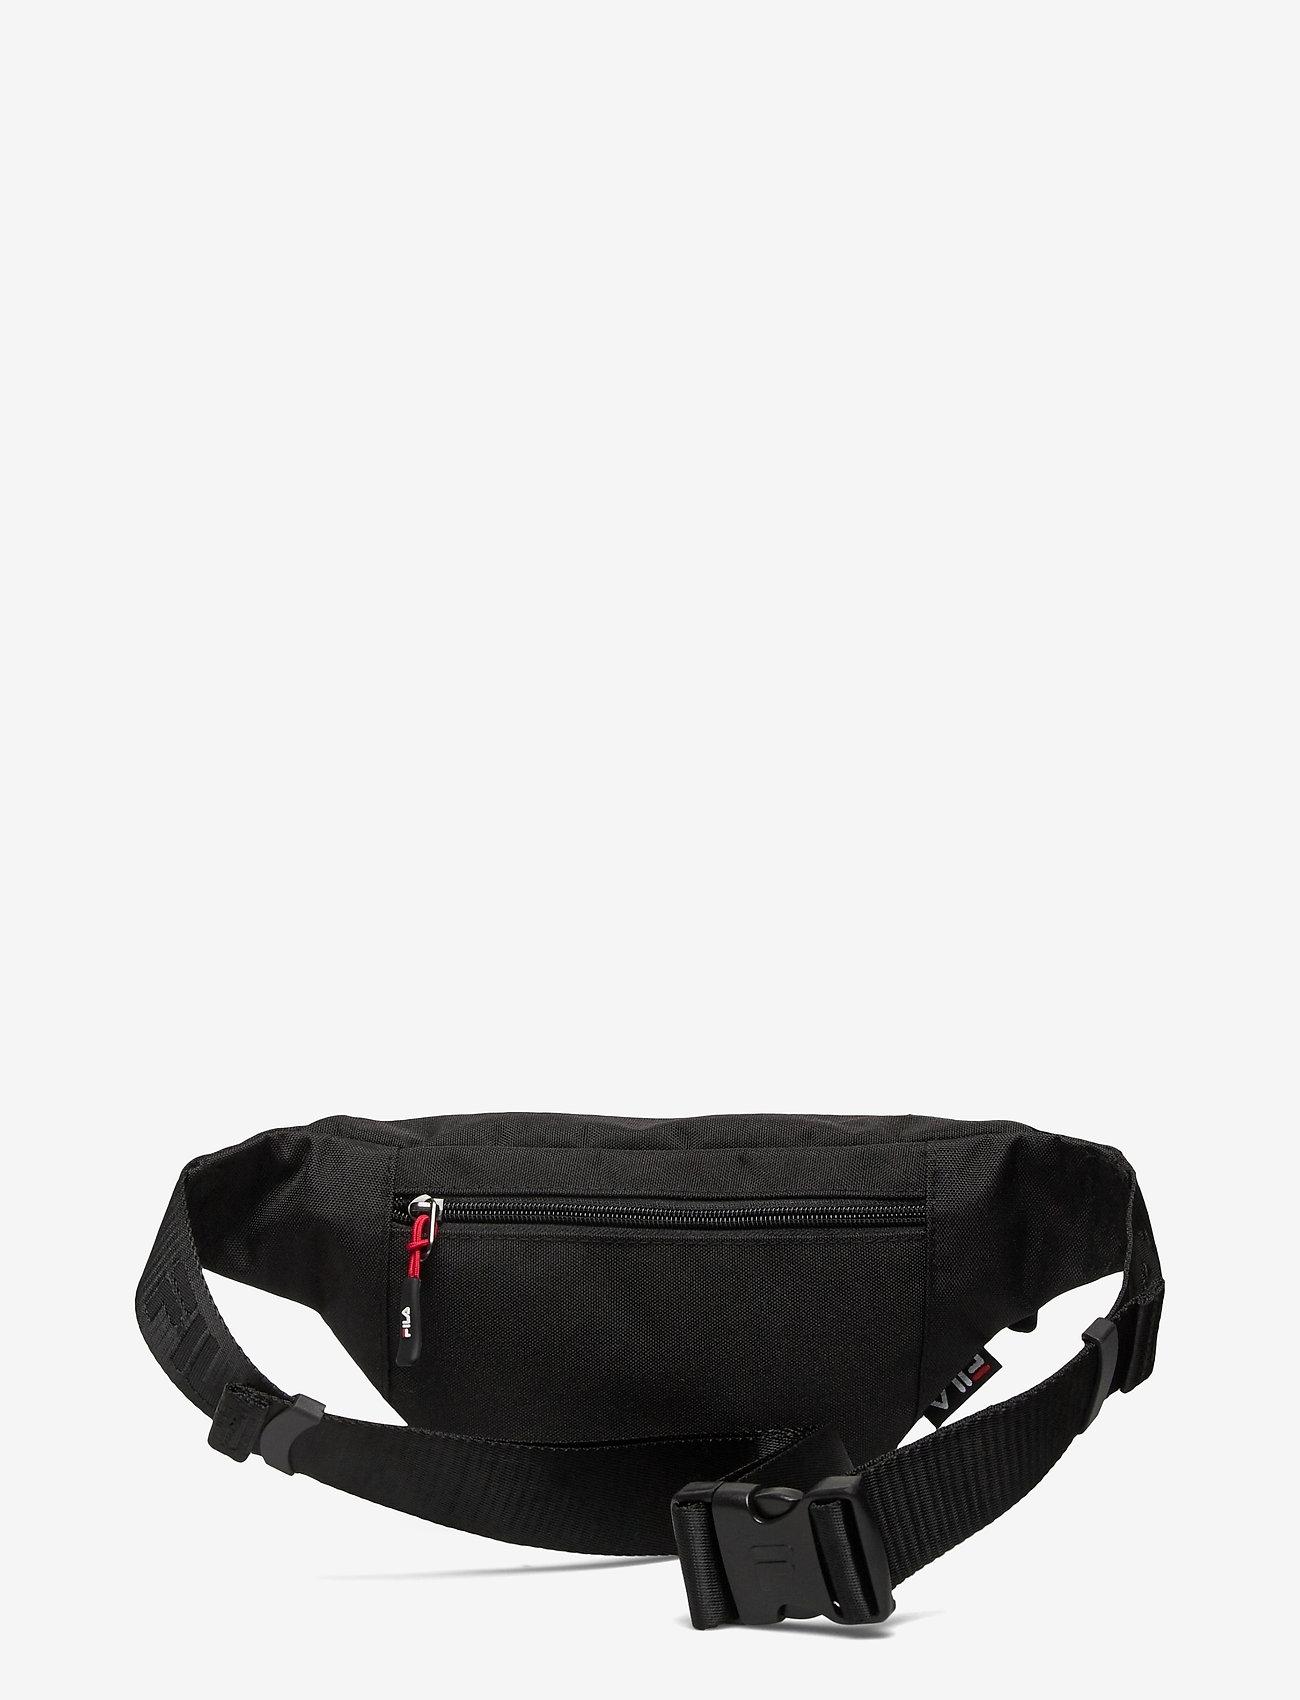 FILA - WAIST BAG SLIM (small logo) - vyölaukut - black - 1